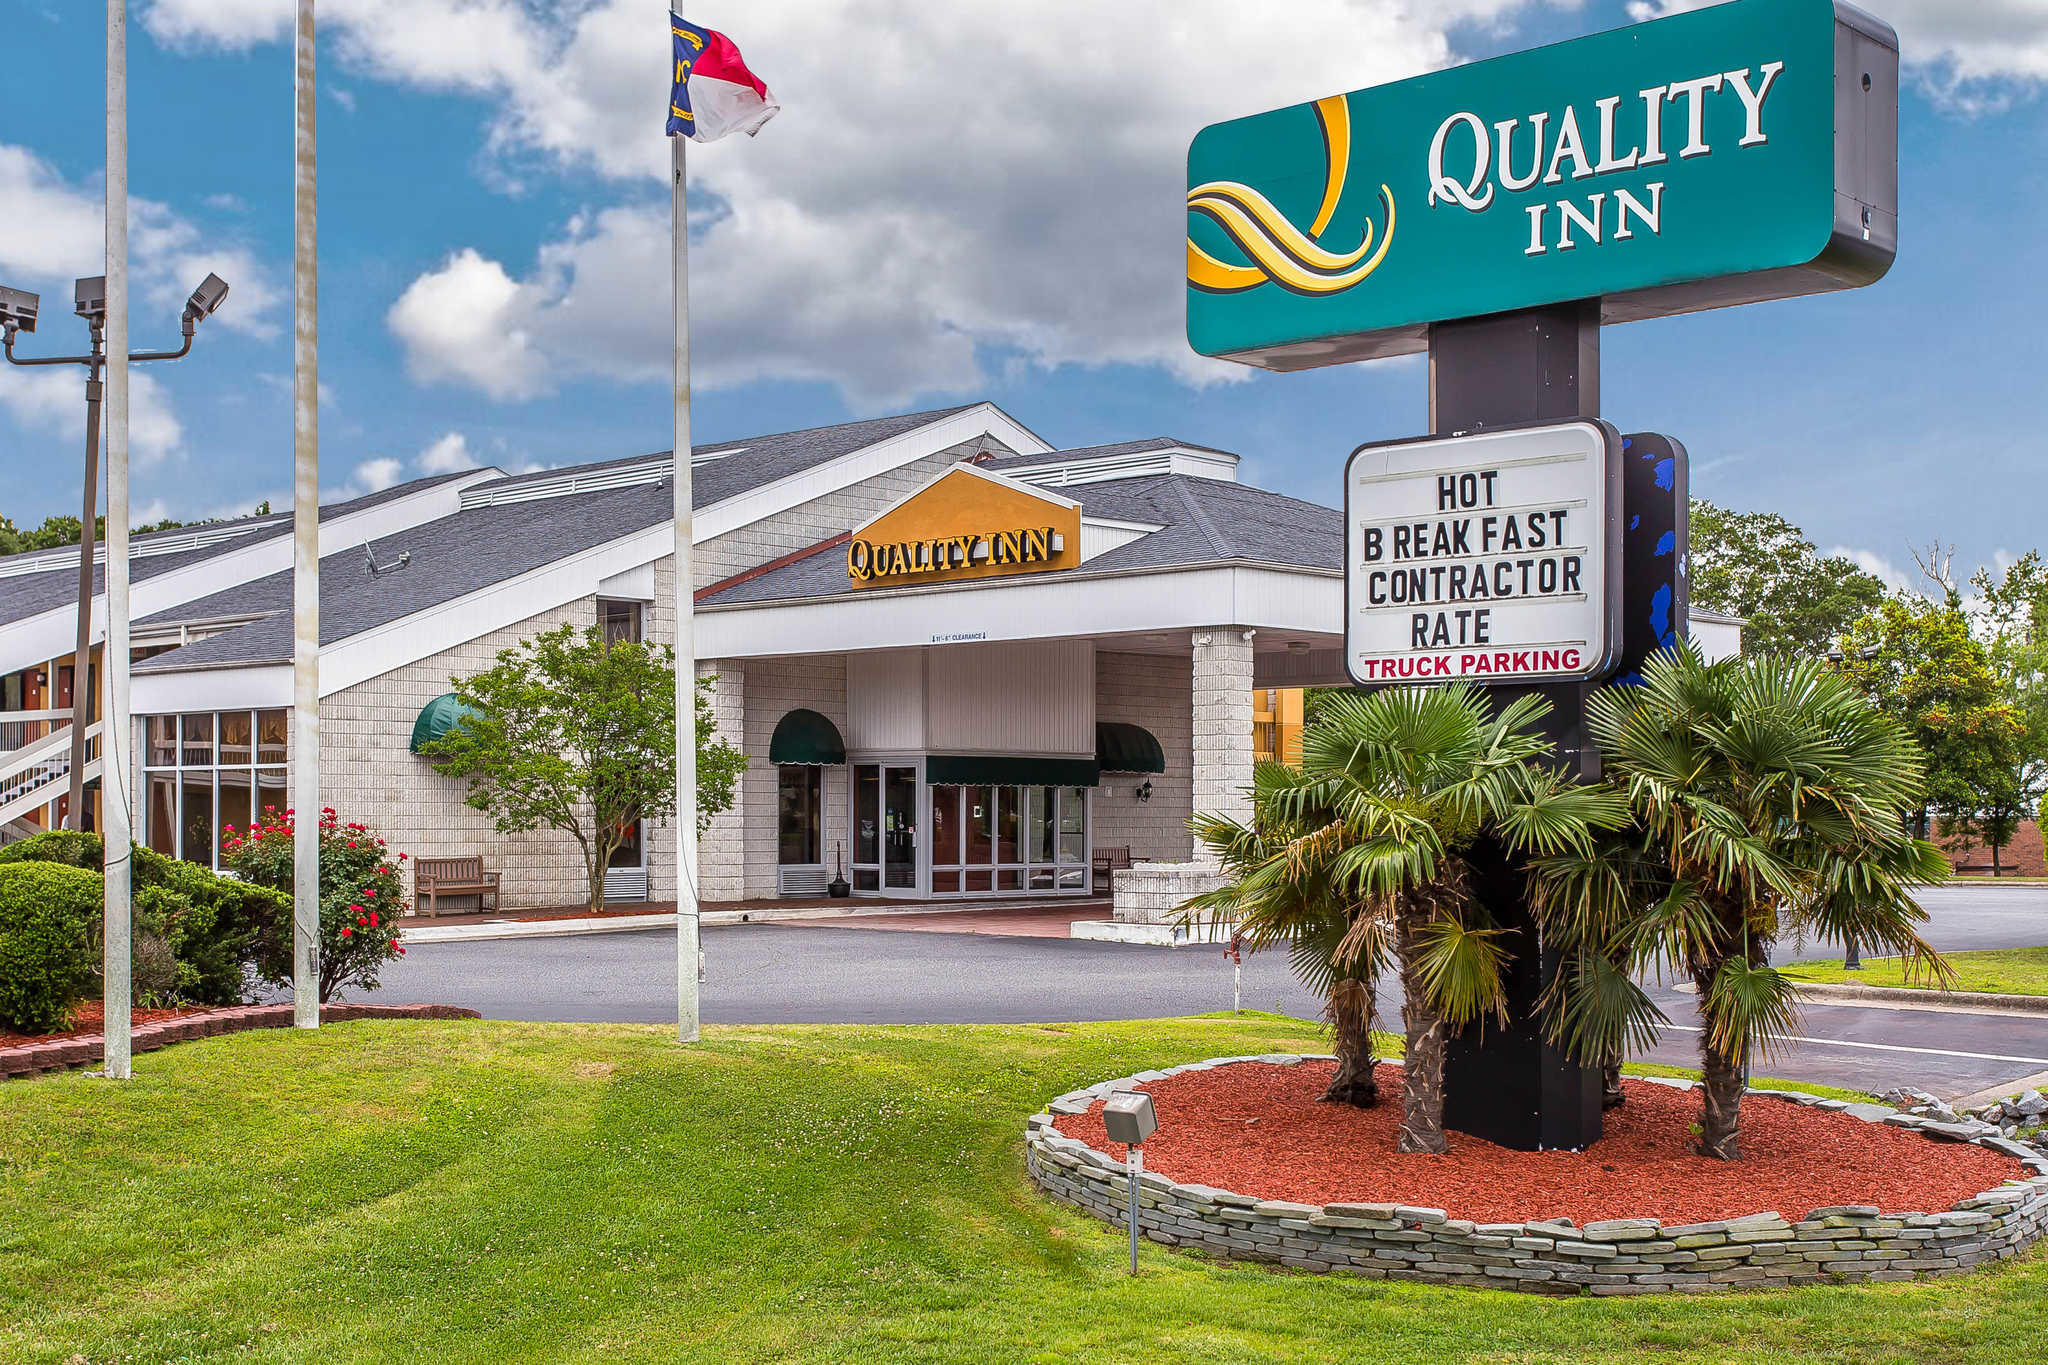 Quality Inn Durham Nc Hotels